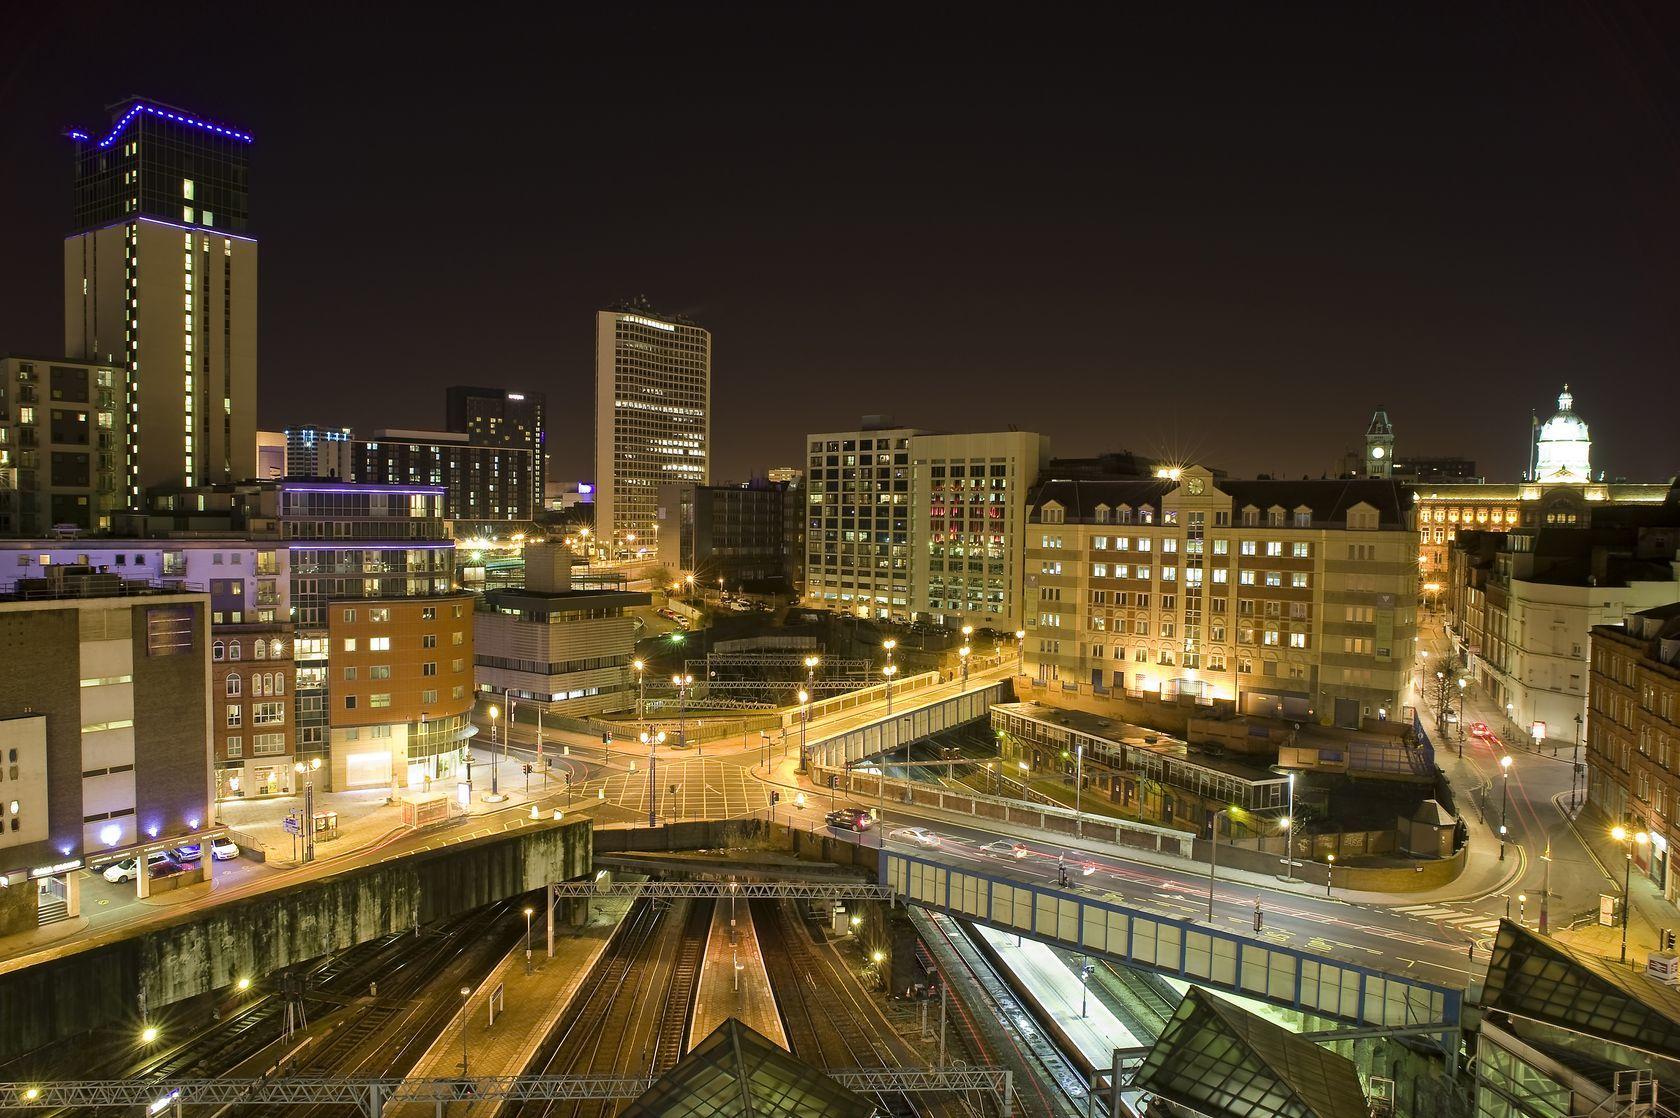 Pohled na město Birmingham v noci | nicunickie/123RF.com